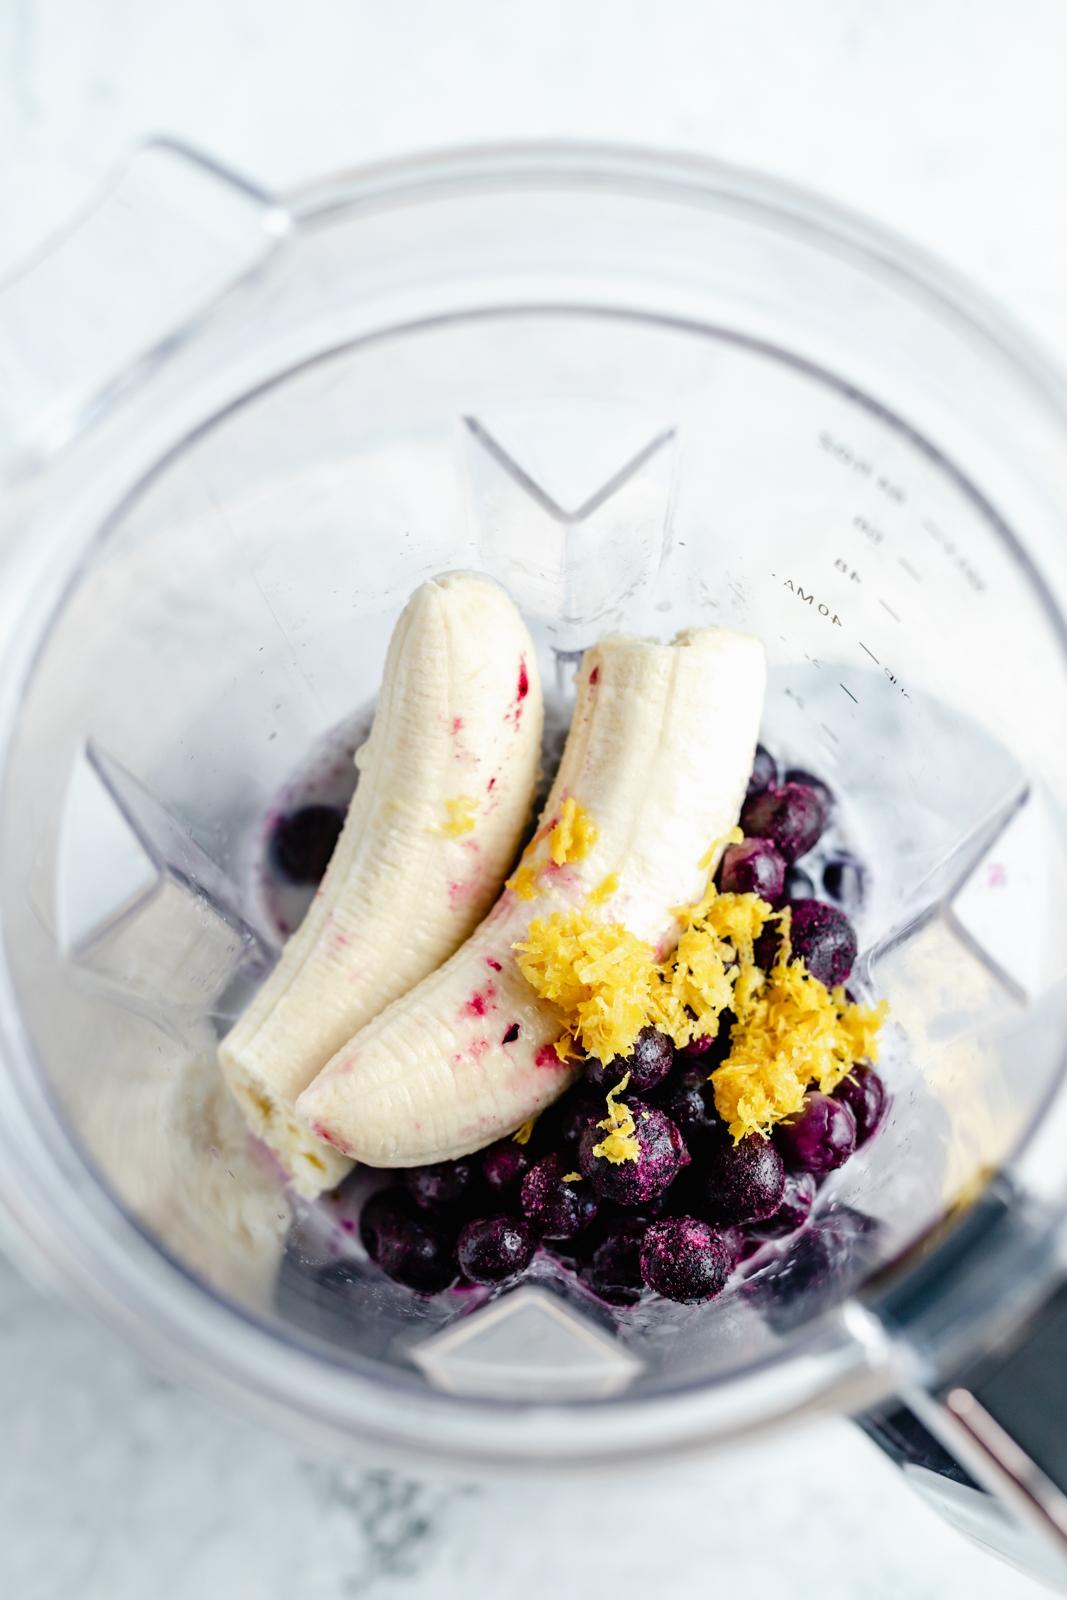 ingredients for a vegan lemon blueberry smoothie in a blender